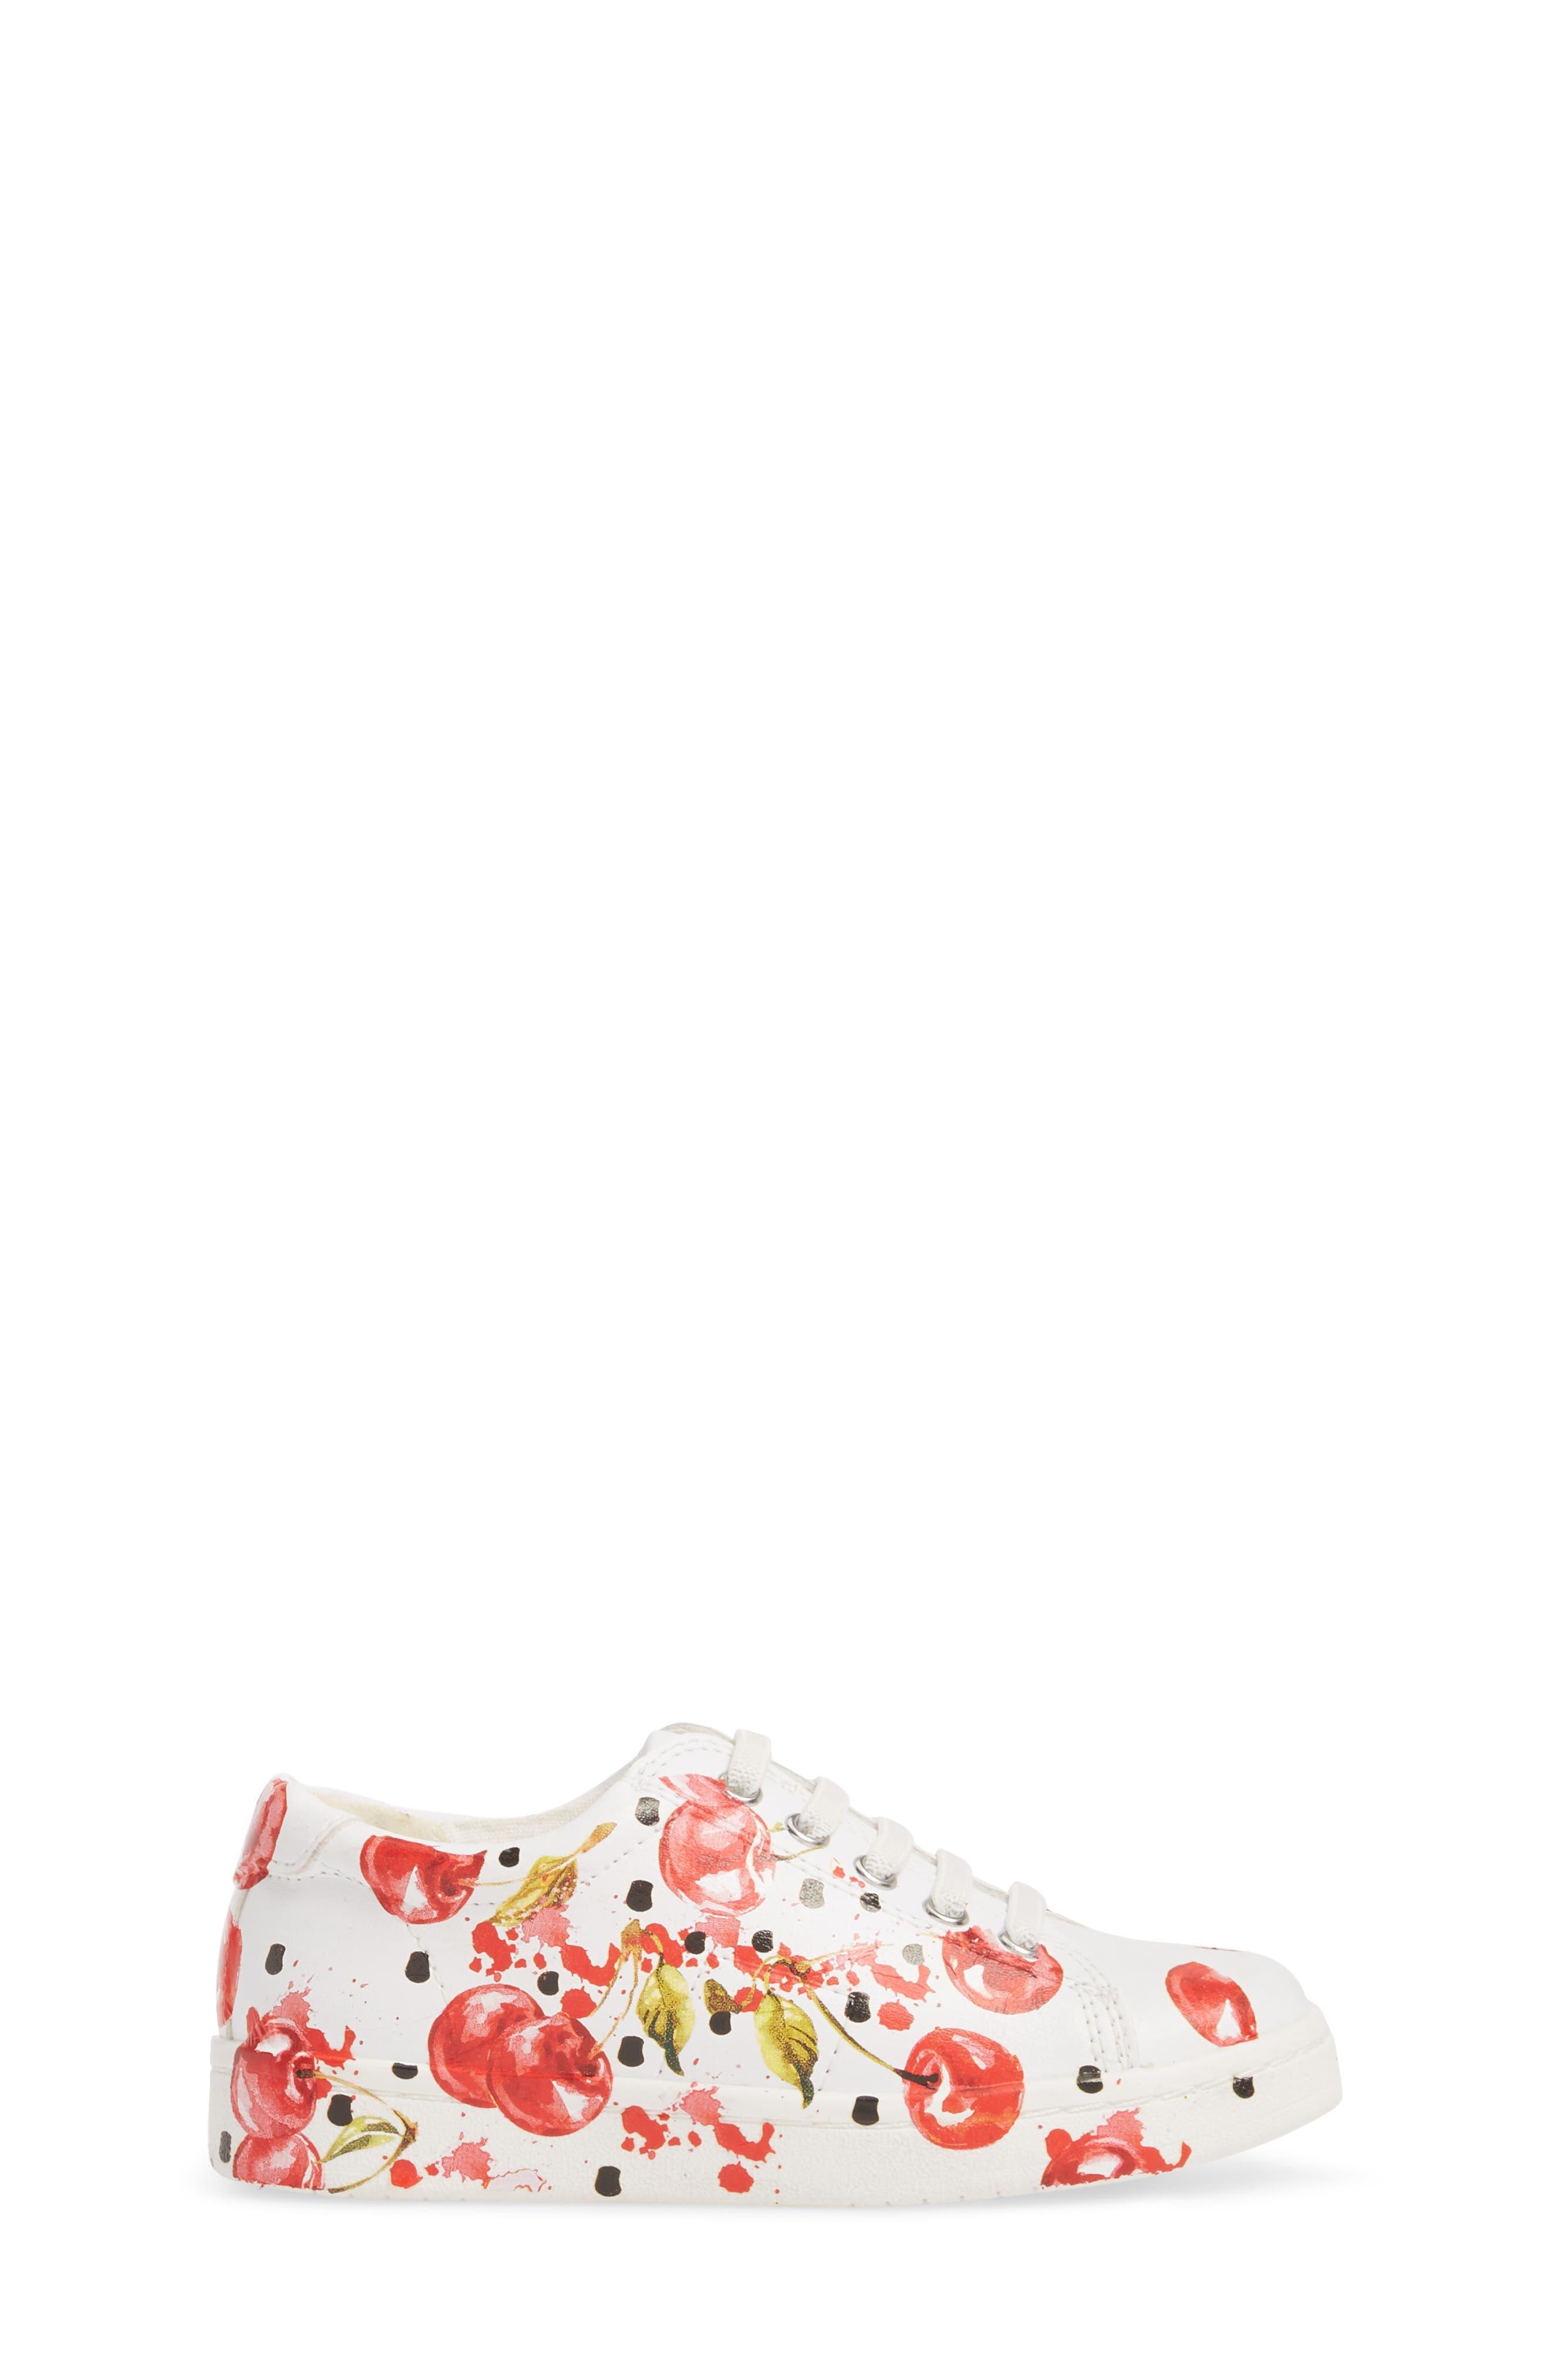 Blane Milford Fruit Print Sneaker,                             Alternate thumbnail 3, color,                             White/ Cherry Faux Leather